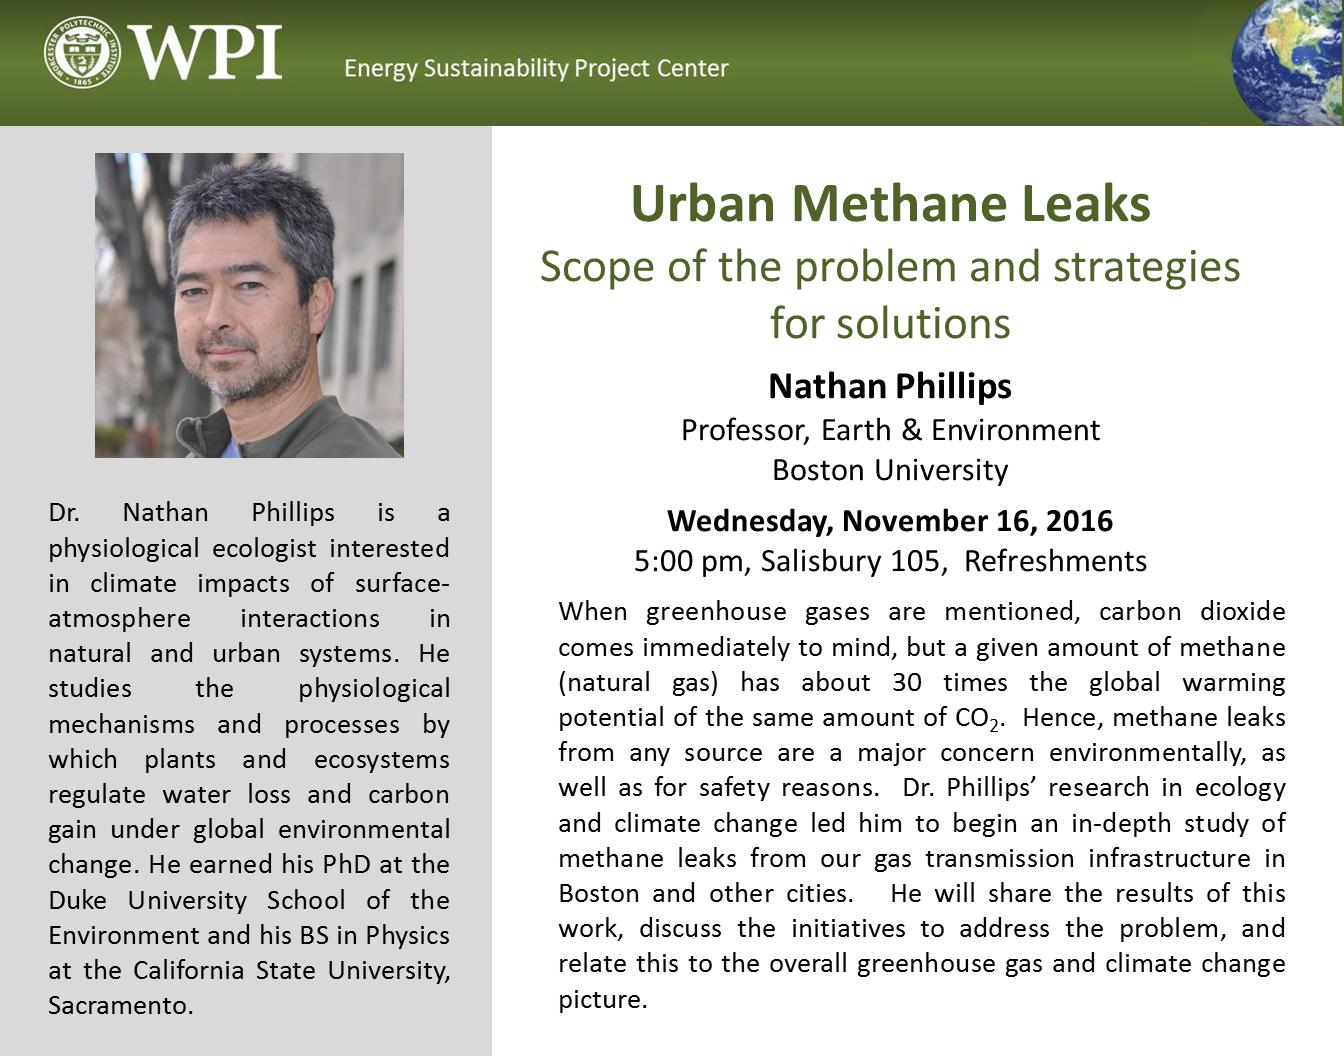 Urban methane leaks seminar